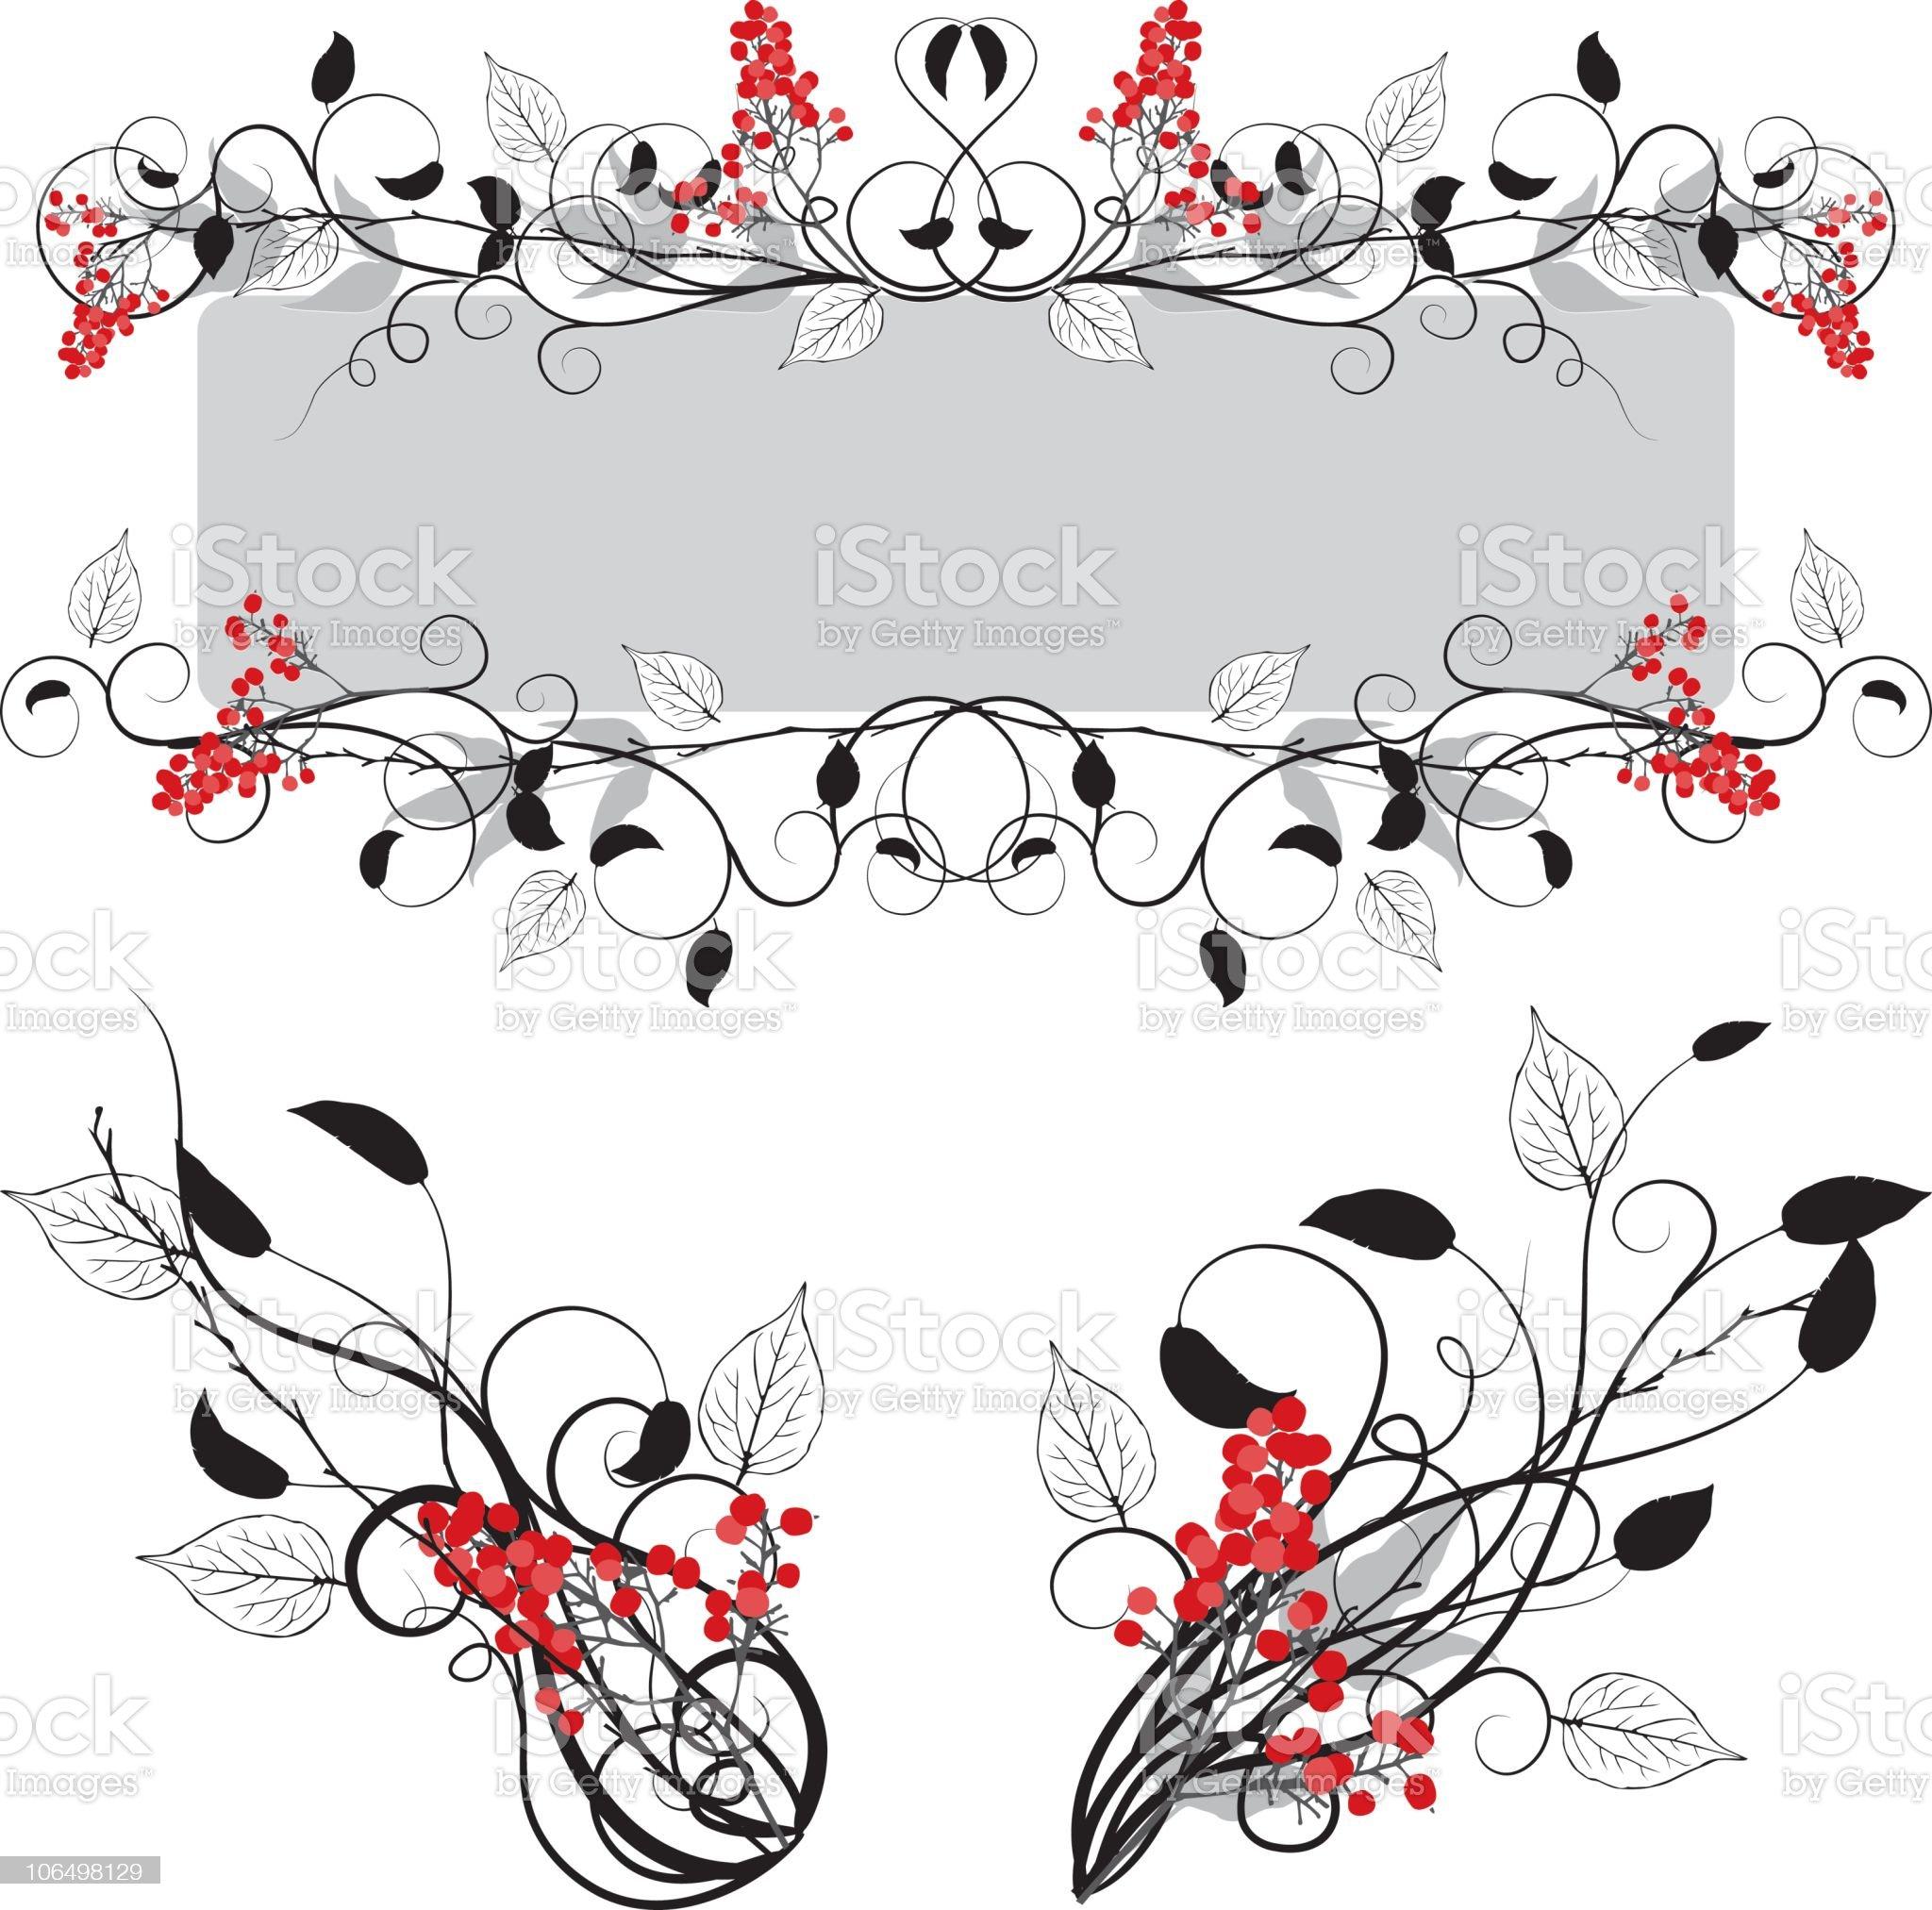 Vector Flourish Ornaments royalty-free stock vector art